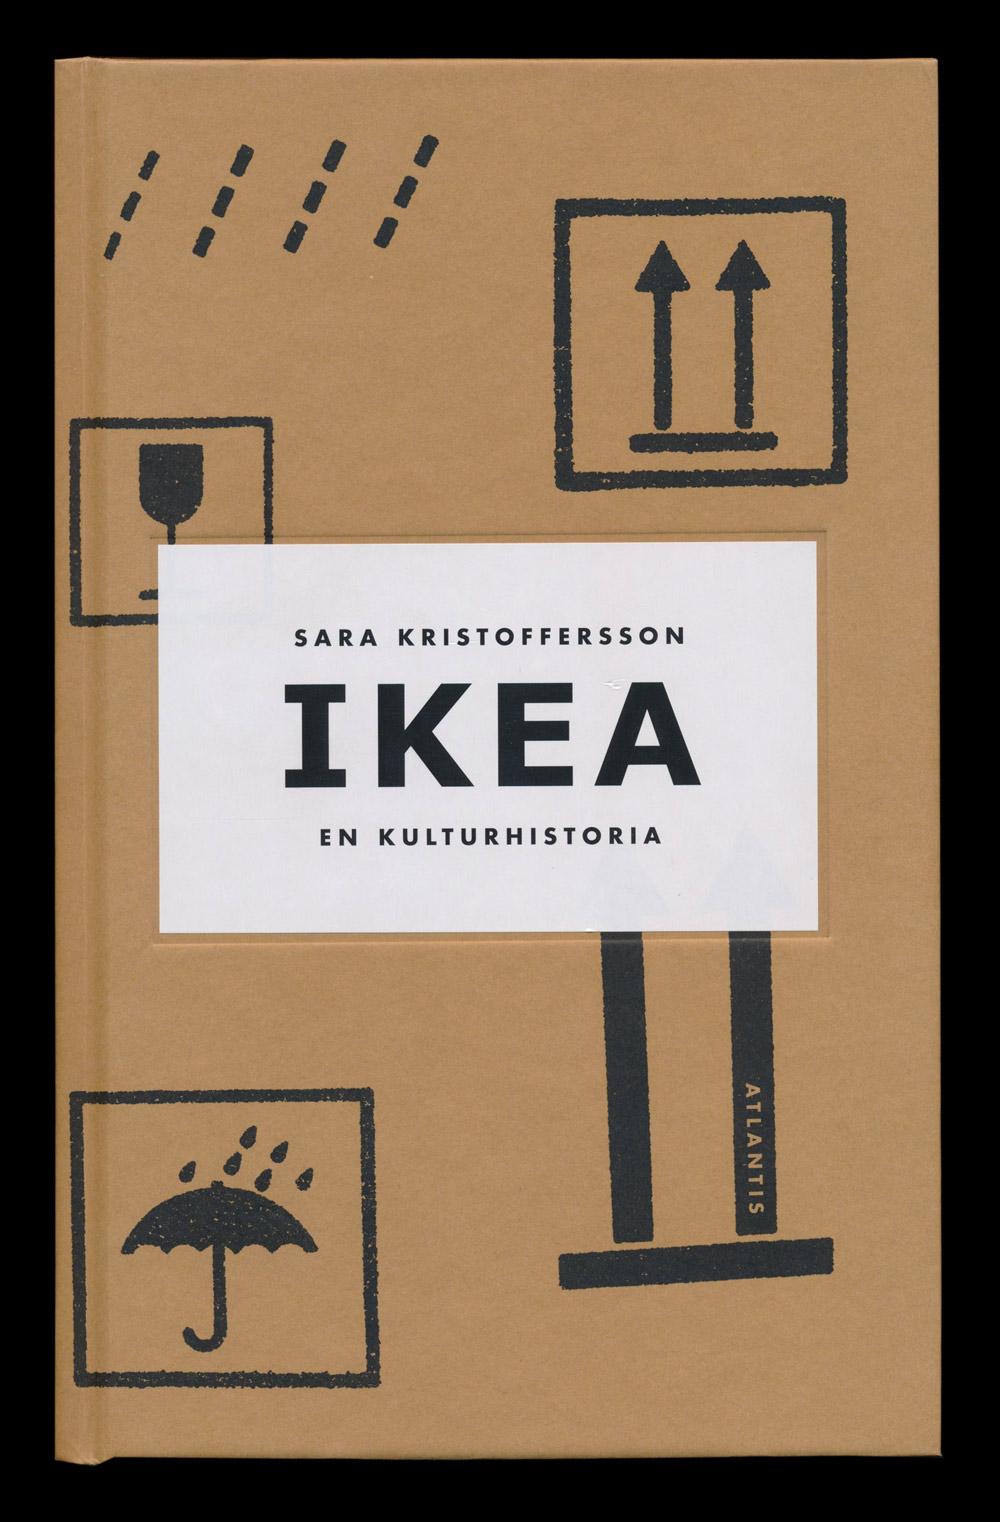 Ikea – en kulturhistoria av Sara Kristoffersson